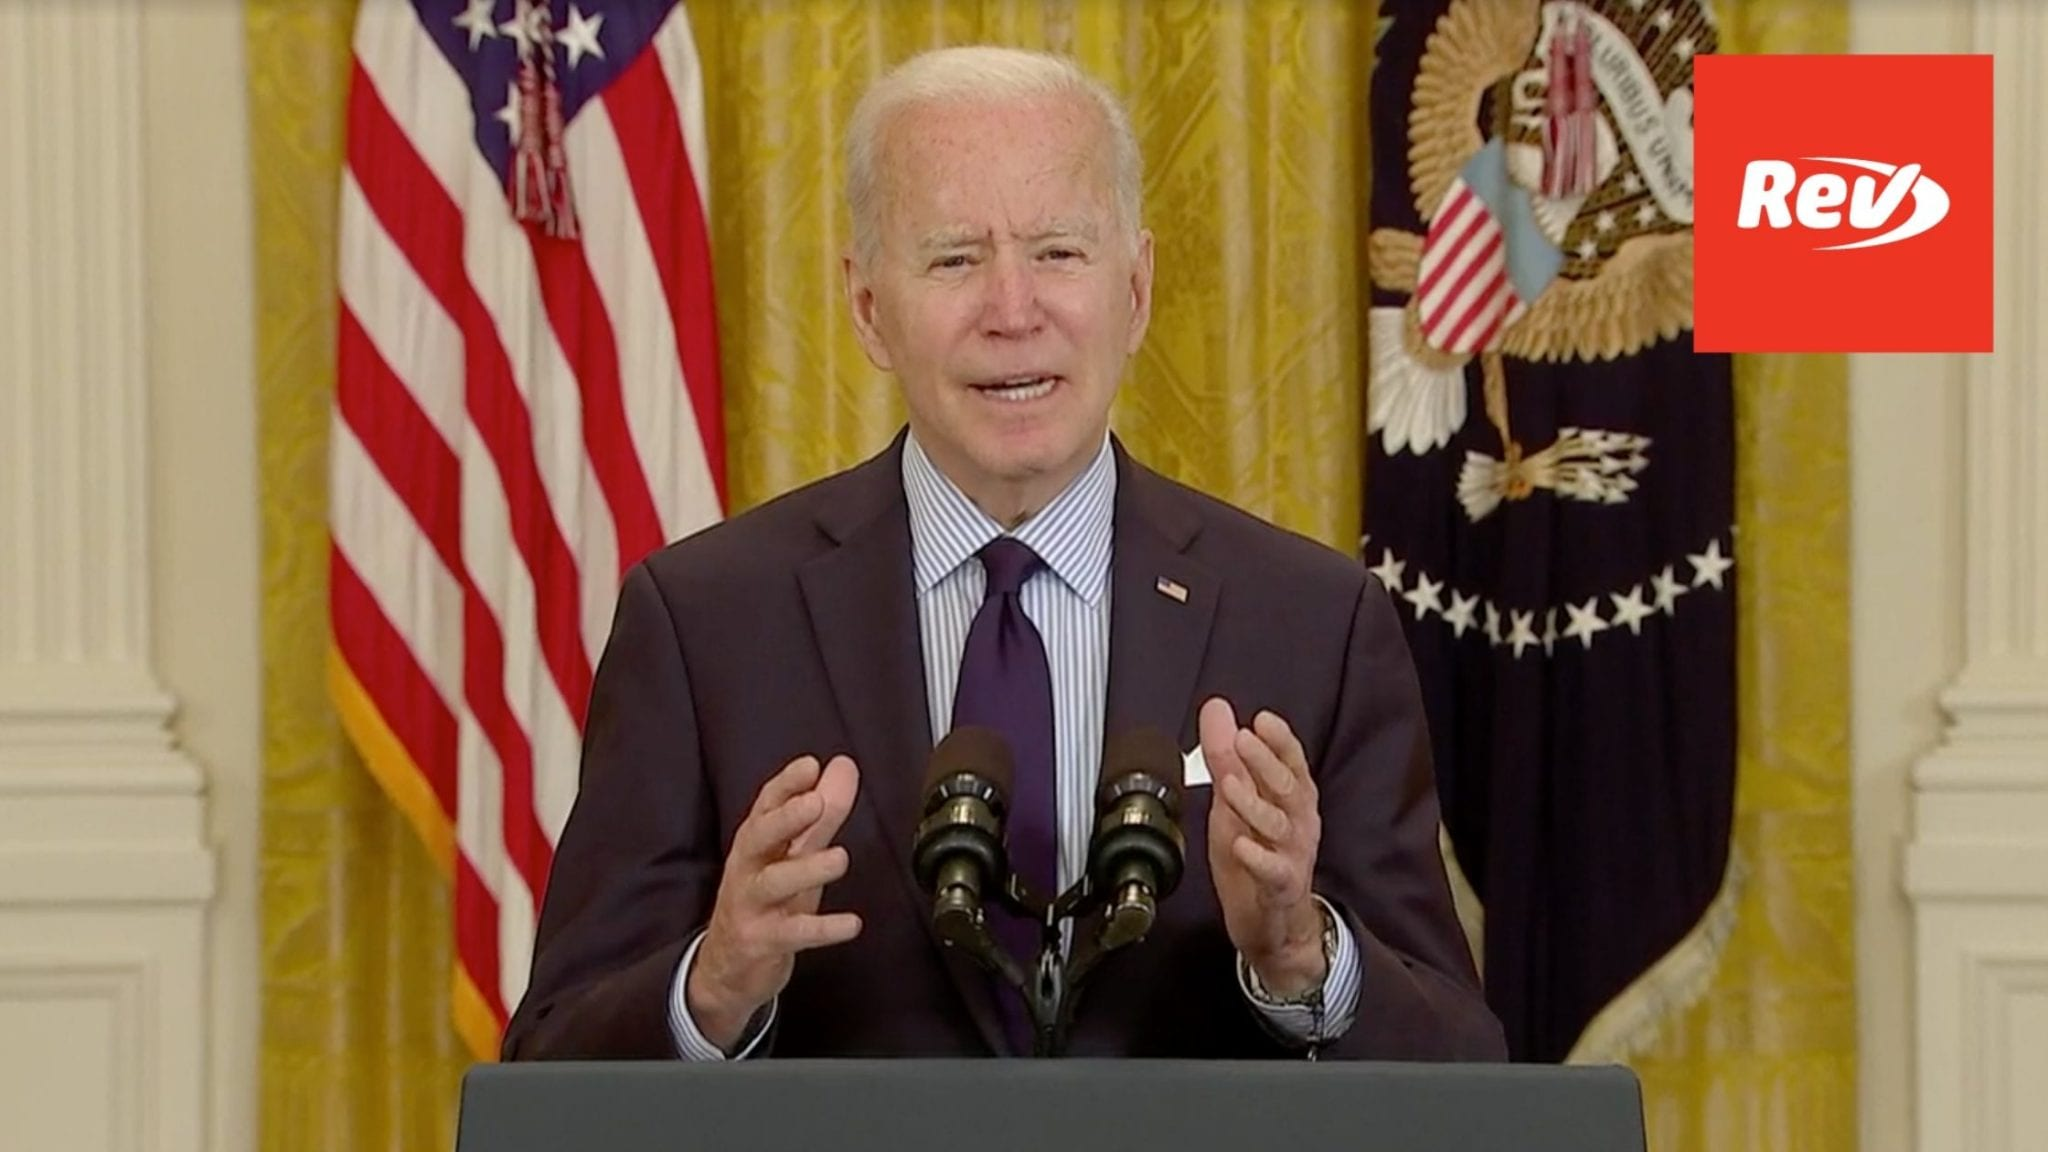 Joe Biden April Jobs Report Speech Briefing Transcript